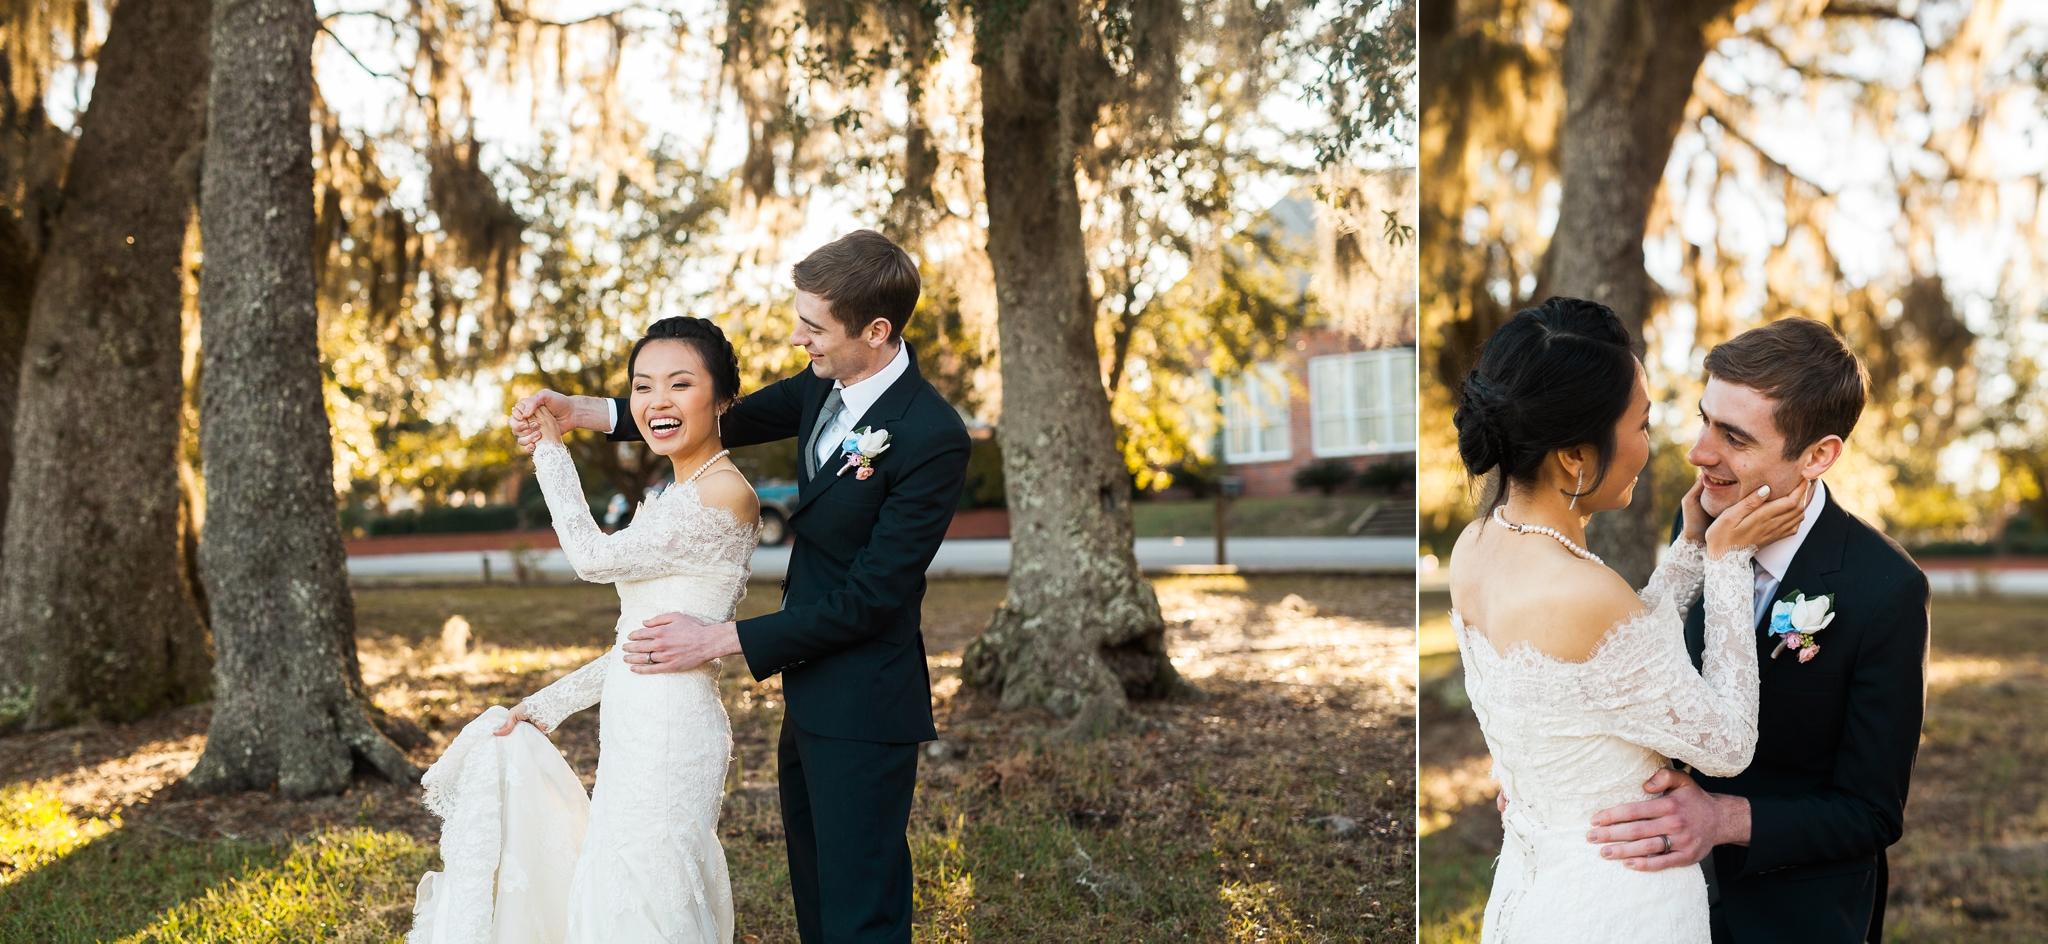 arkansas-wedding-photographer_0051.jpg